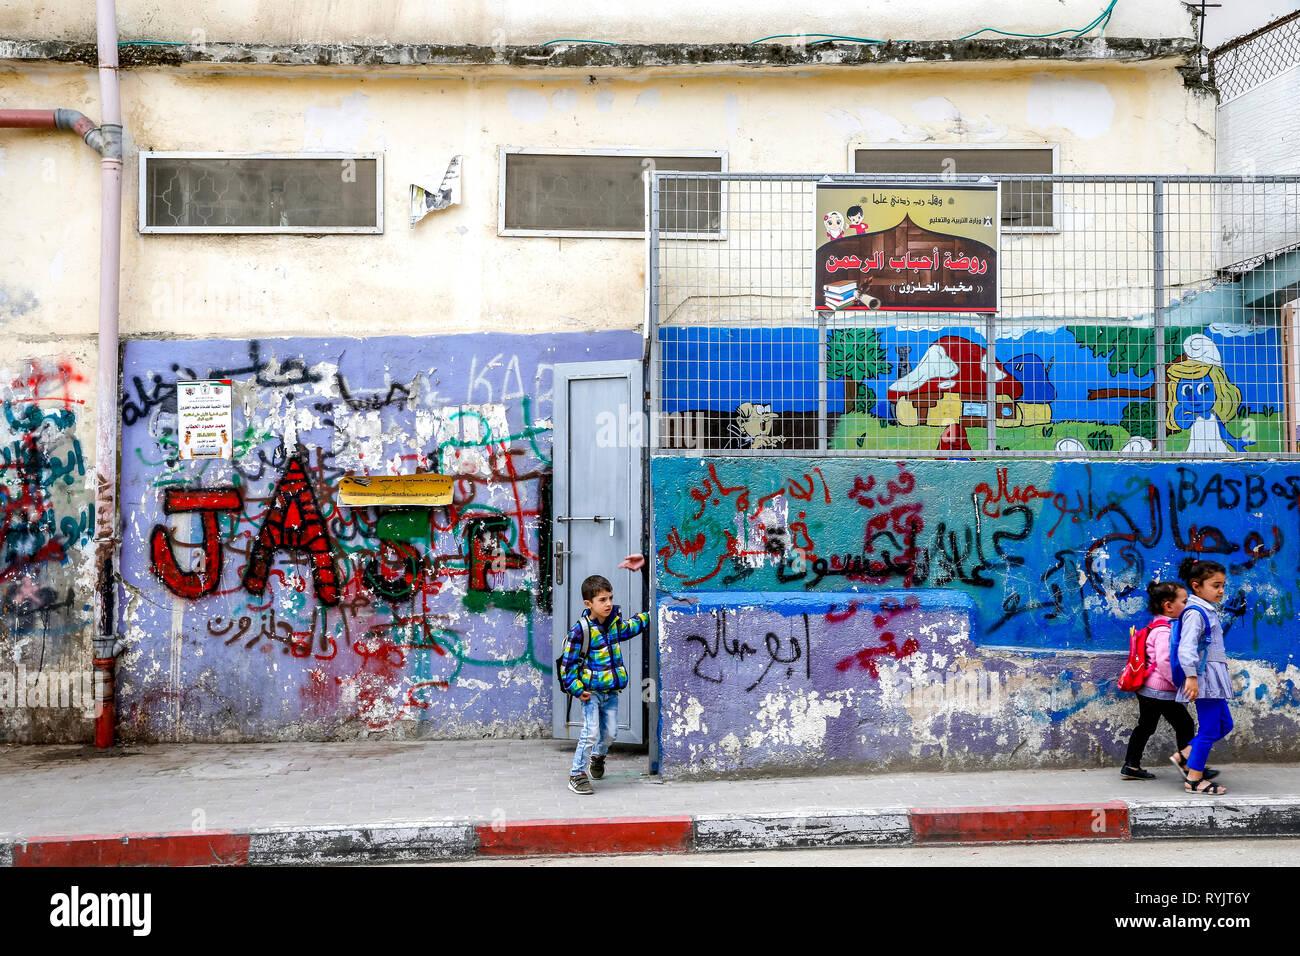 Palestinian schoolchildren in Jalazone refugee camp near Ramallah, West Bank, Palestine. - Stock Image